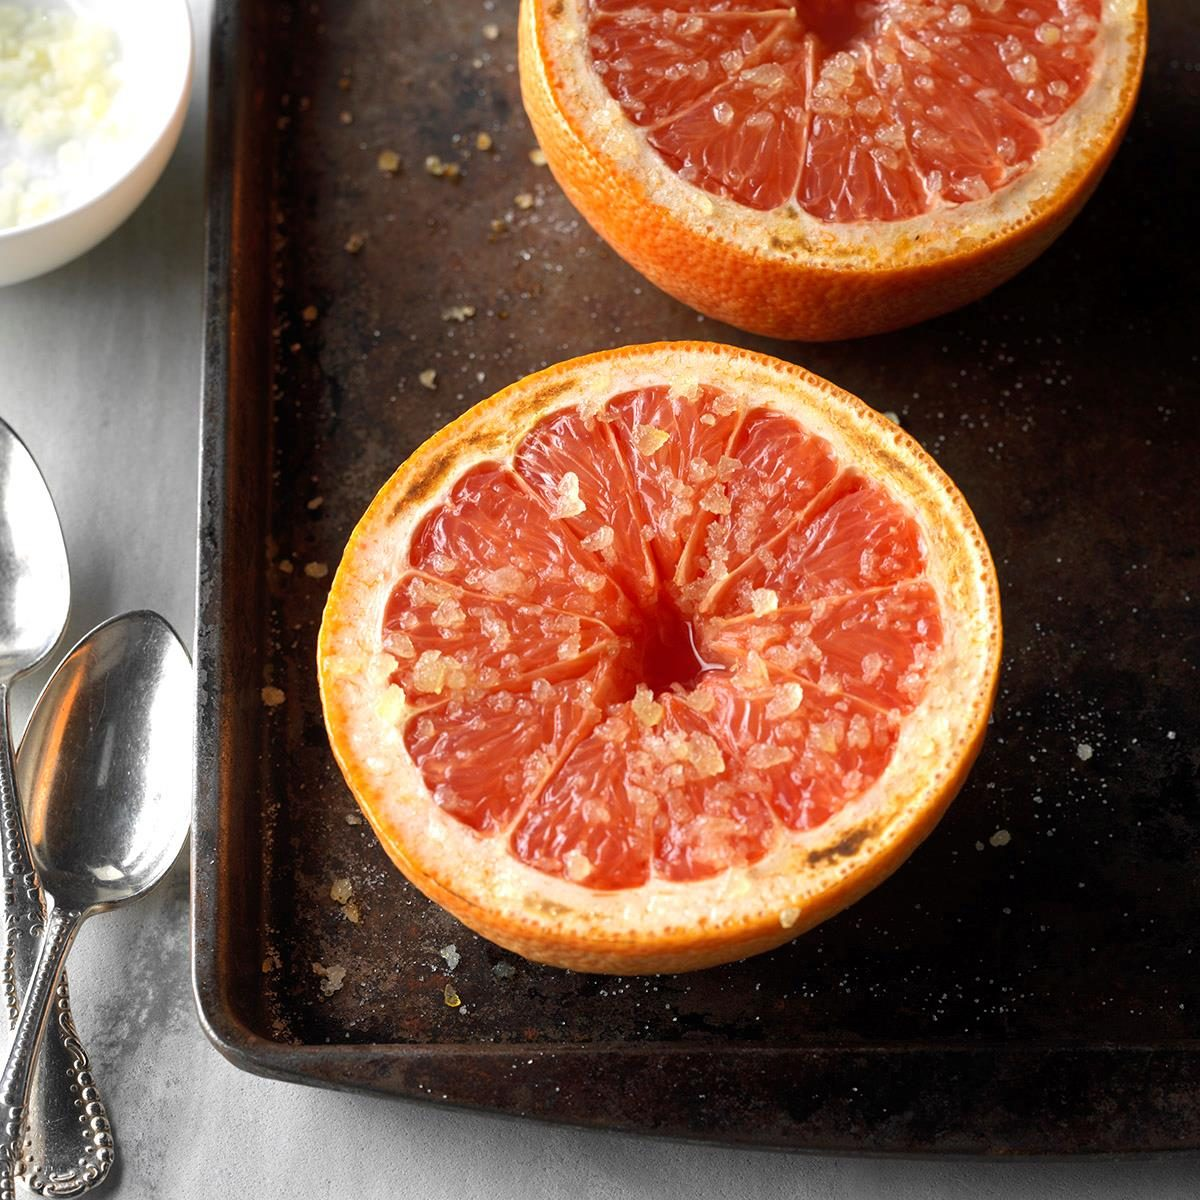 Warm Grapefruit with Ginger-Sugar